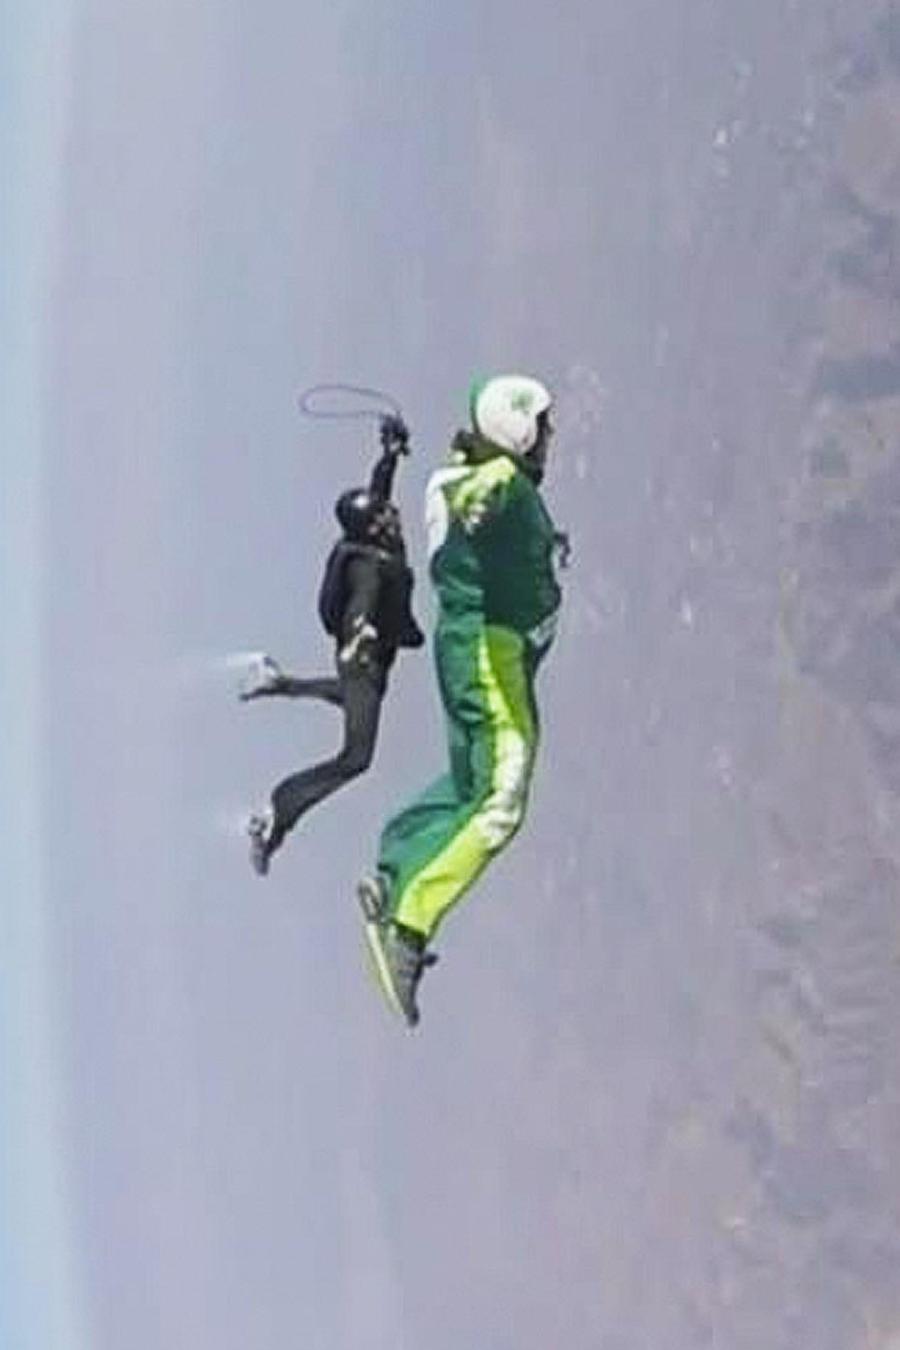 salta de avion sin paracaidas